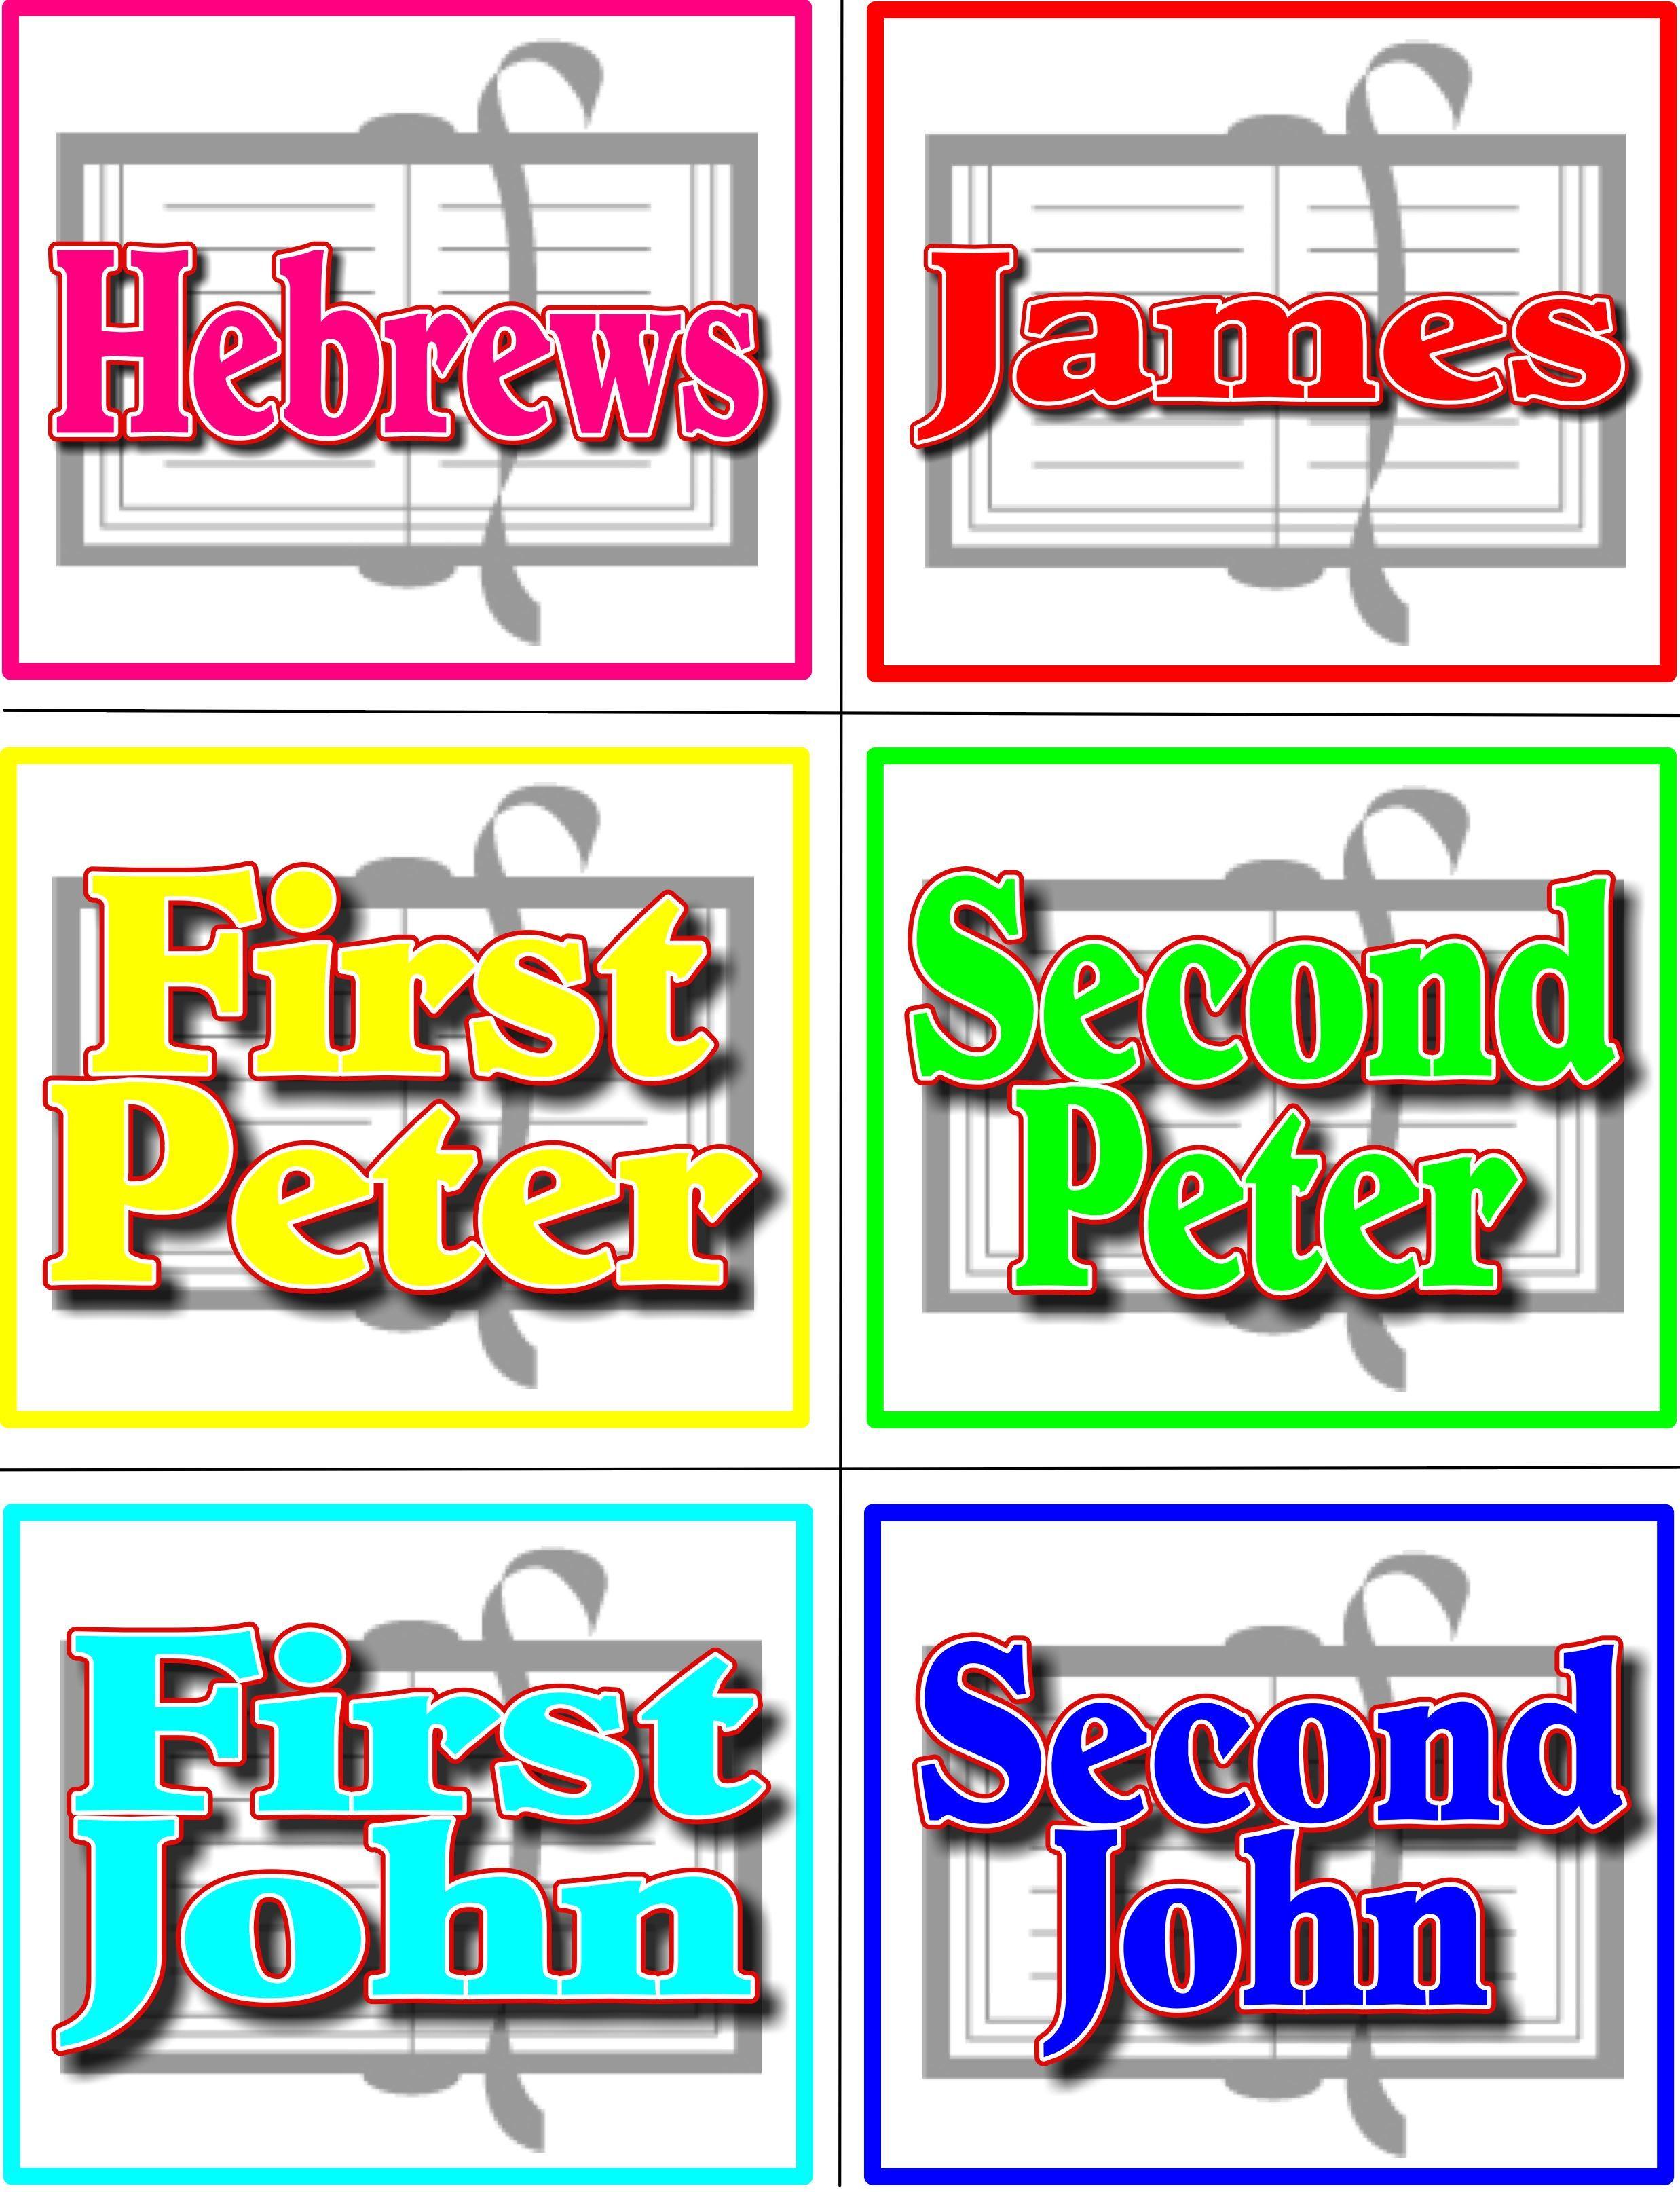 Books Of Bible Ntp4 2 475 3 229 Pixels